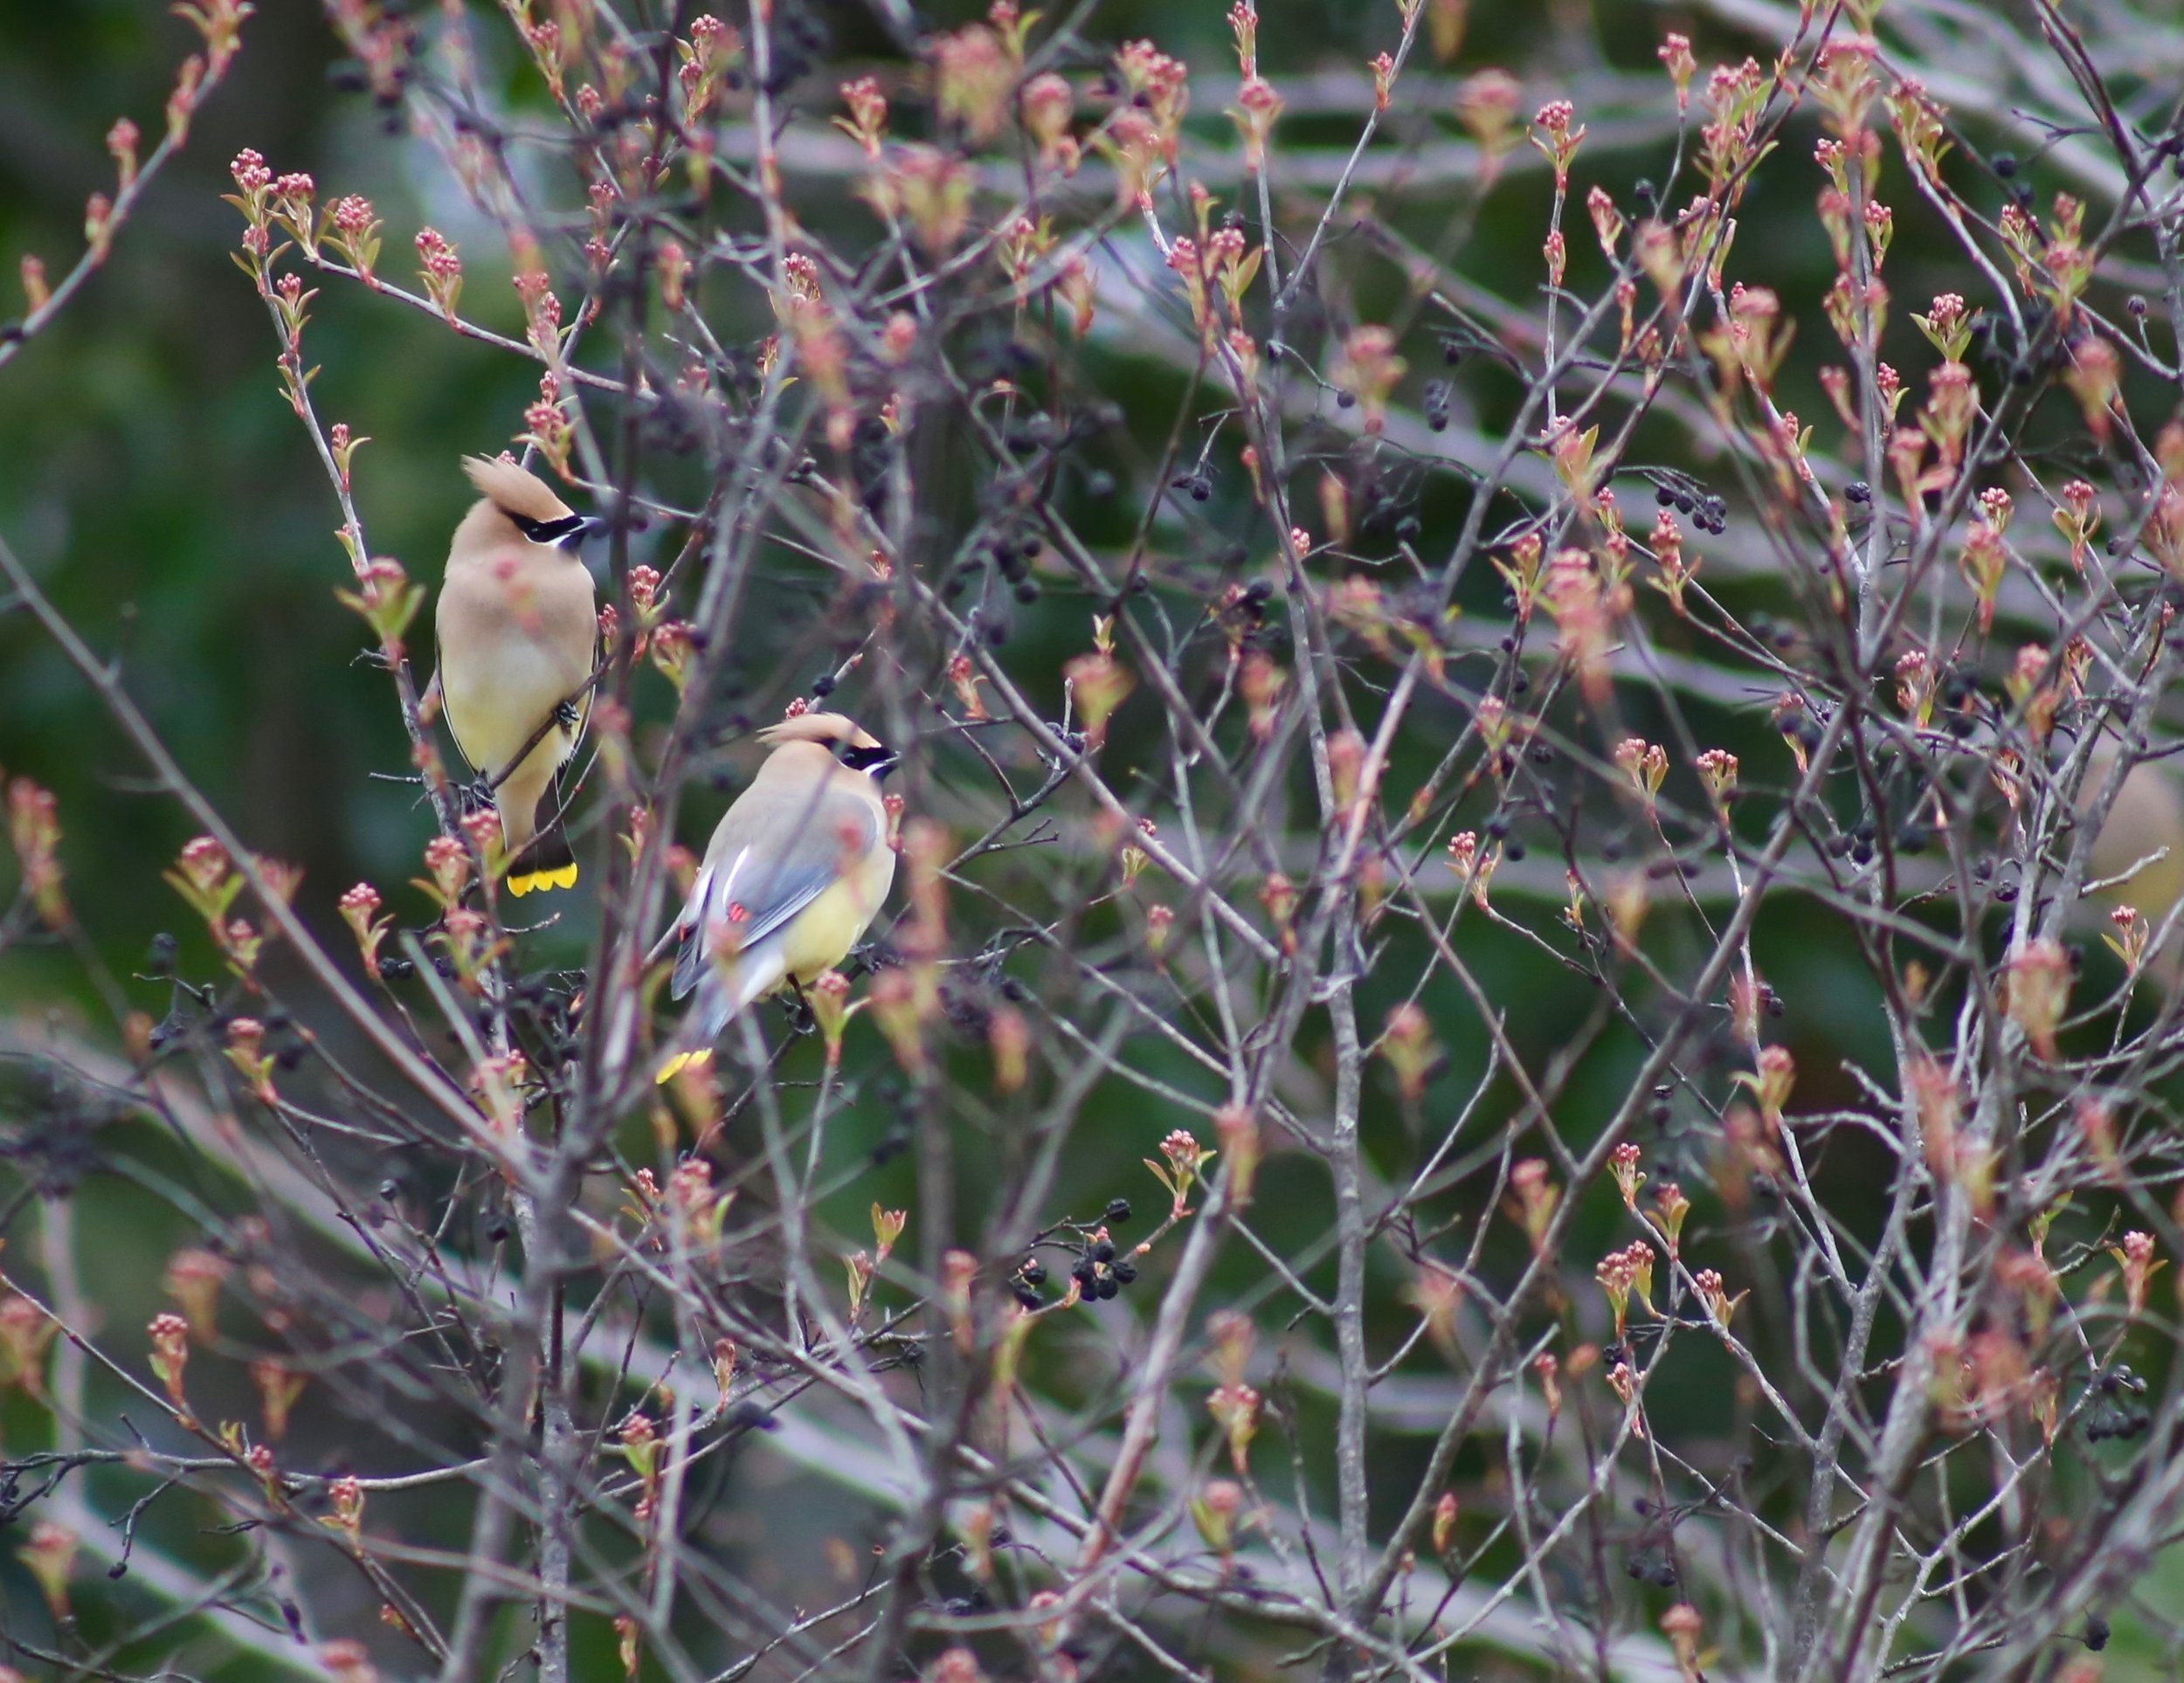 Bombycilla cedrorum on Aronia arbutifolia